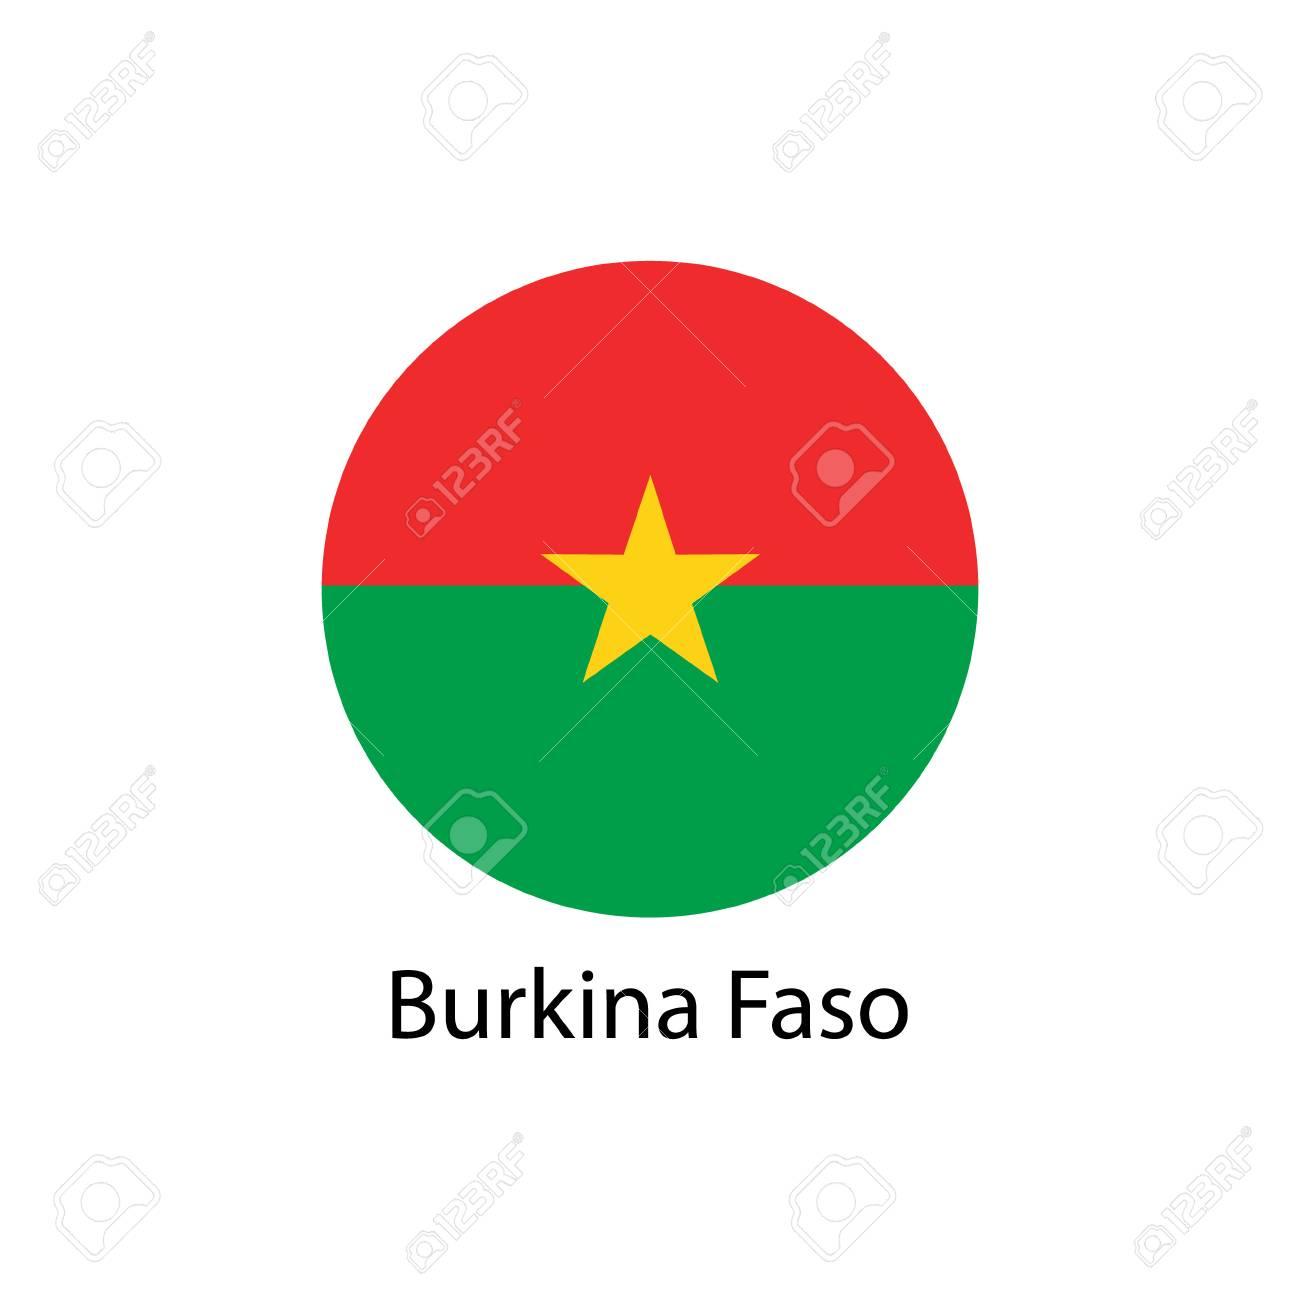 Image result for burkina faso name